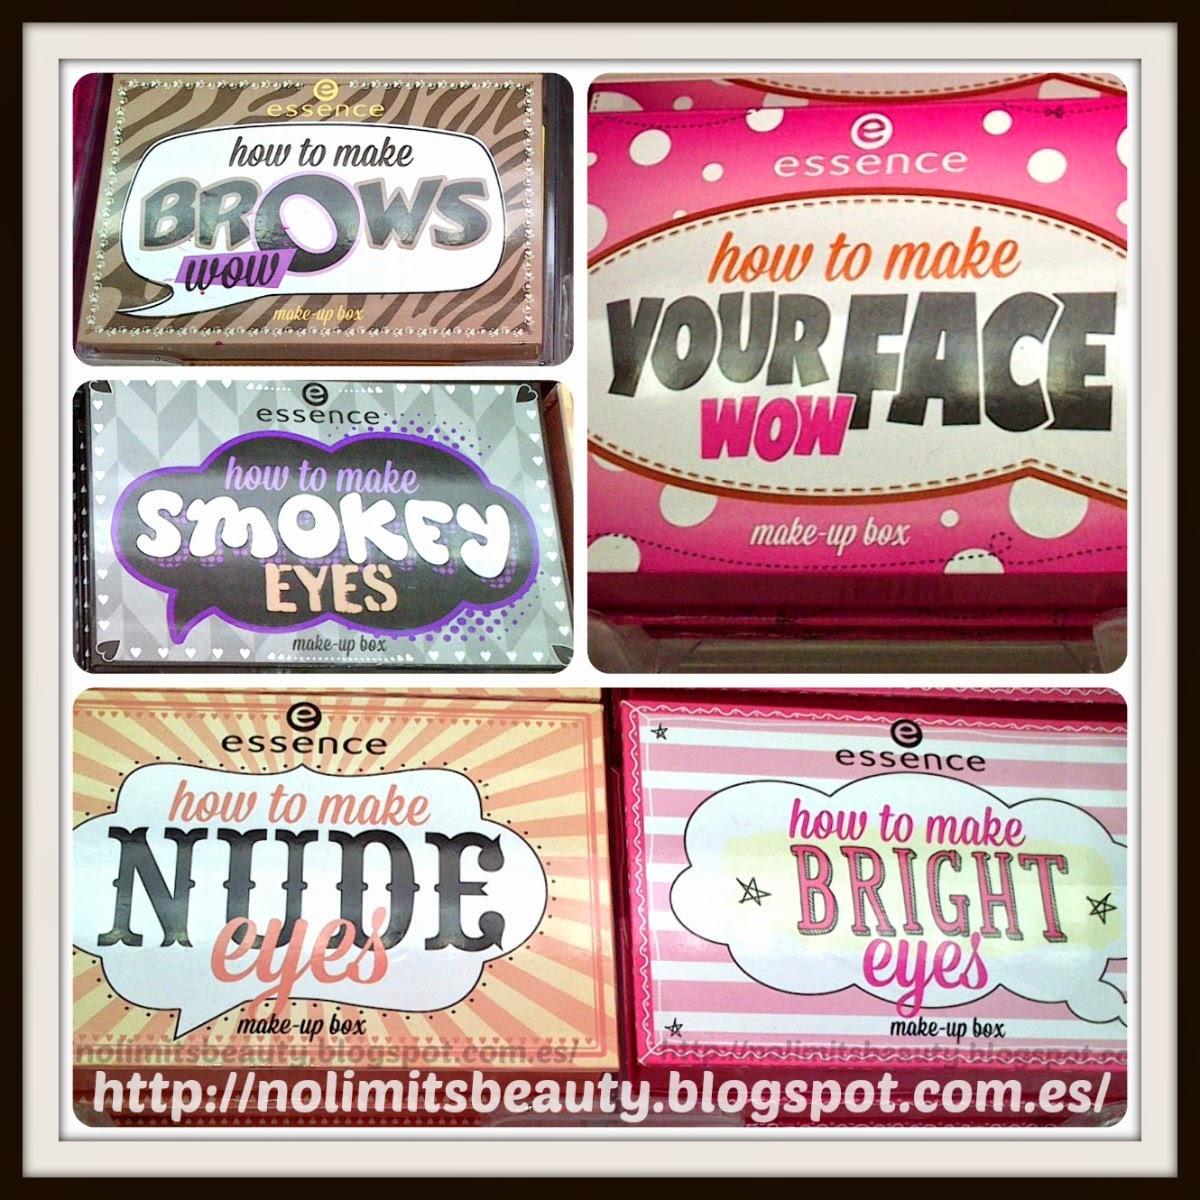 Novedades Essence Verano 2014: make up boxes